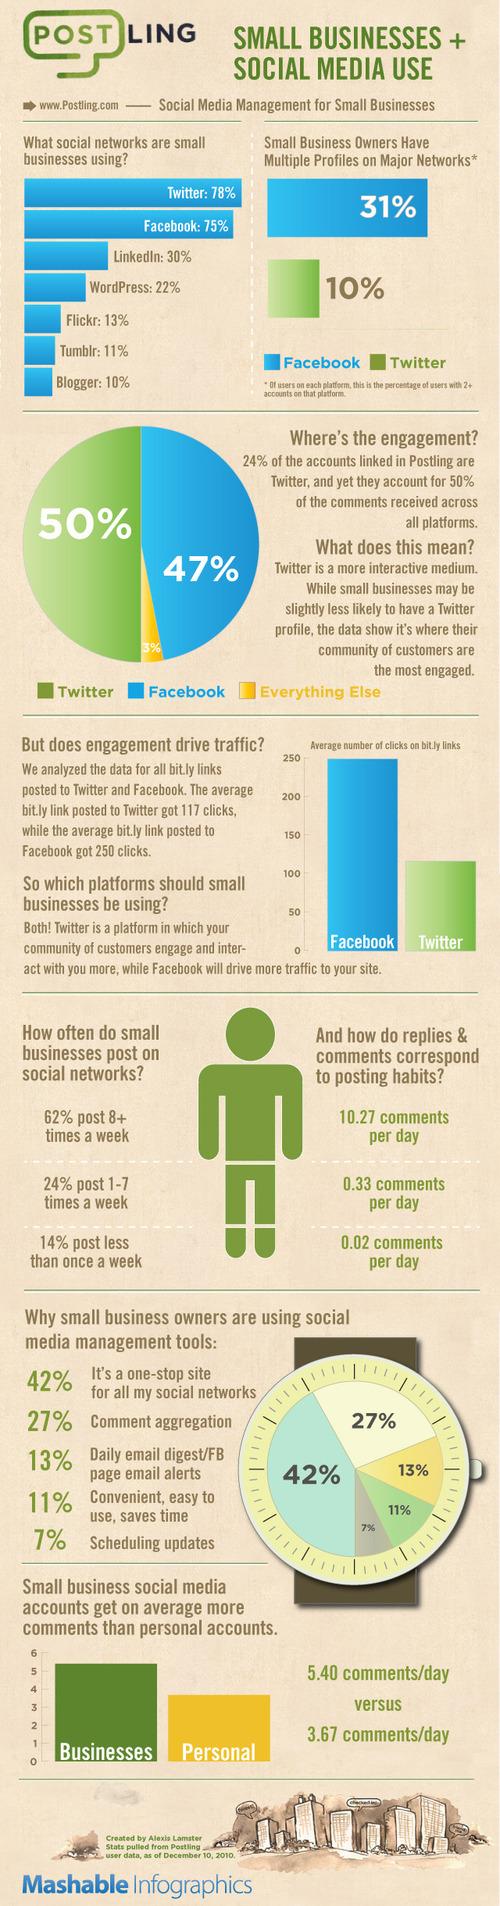 small business social media resized 600